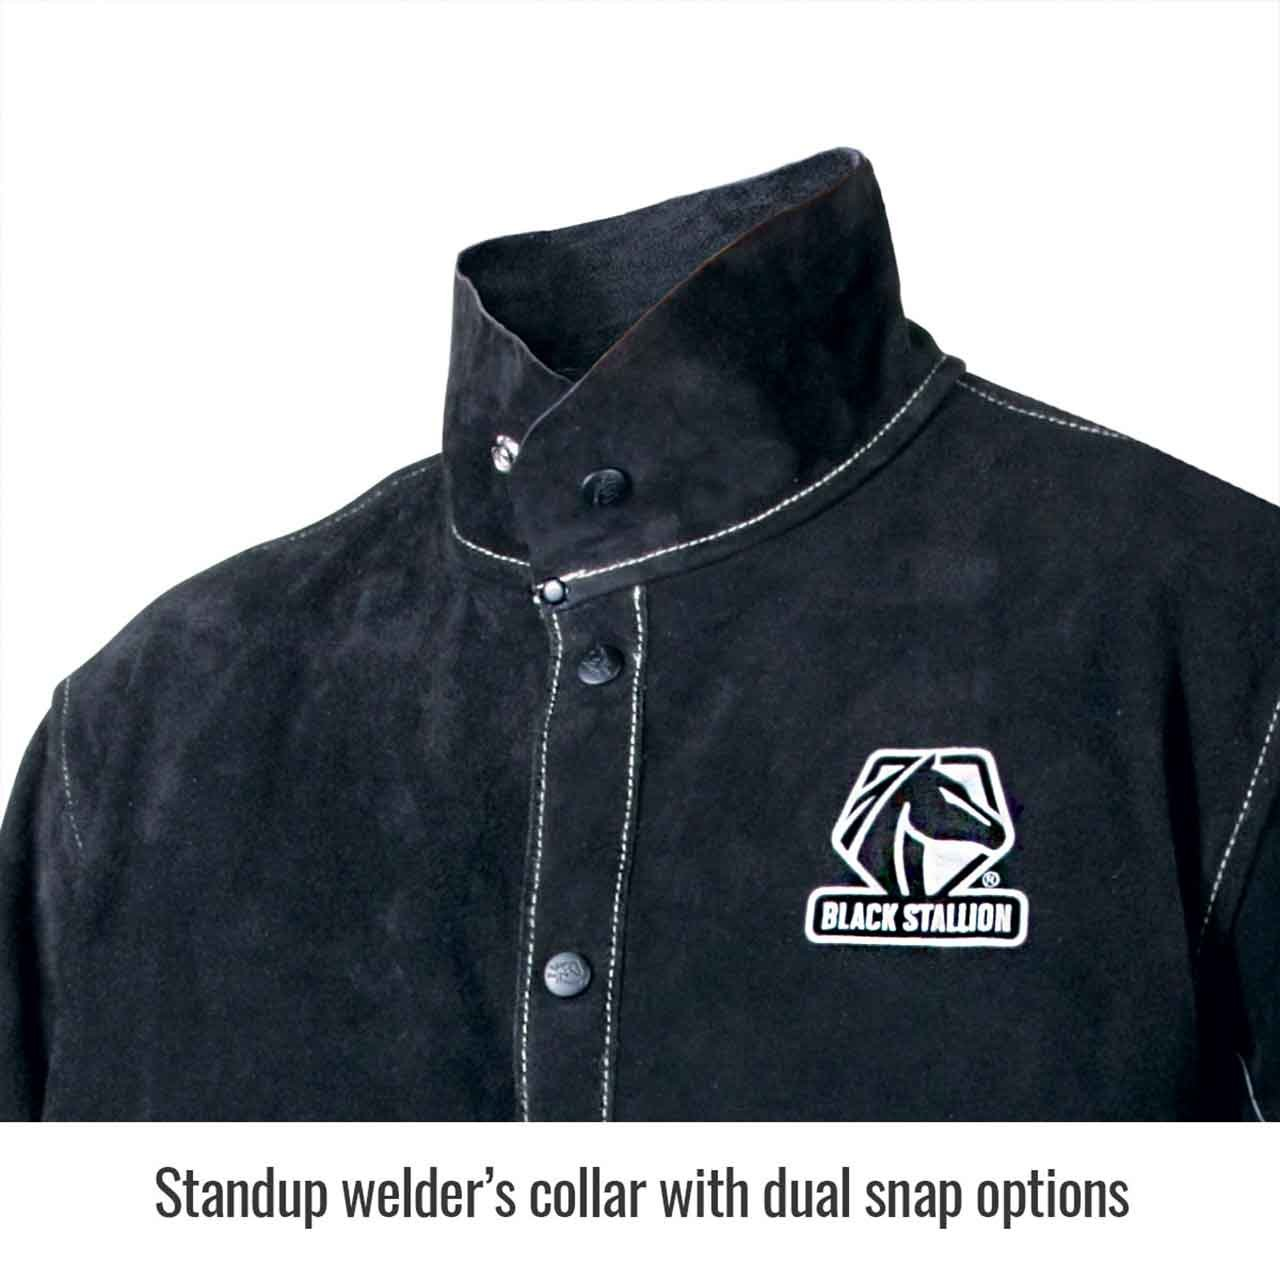 Black Stallion JL1030-BB Color Block Leather Welding Jacket, 3X-Large by Black Stallion (Image #2)